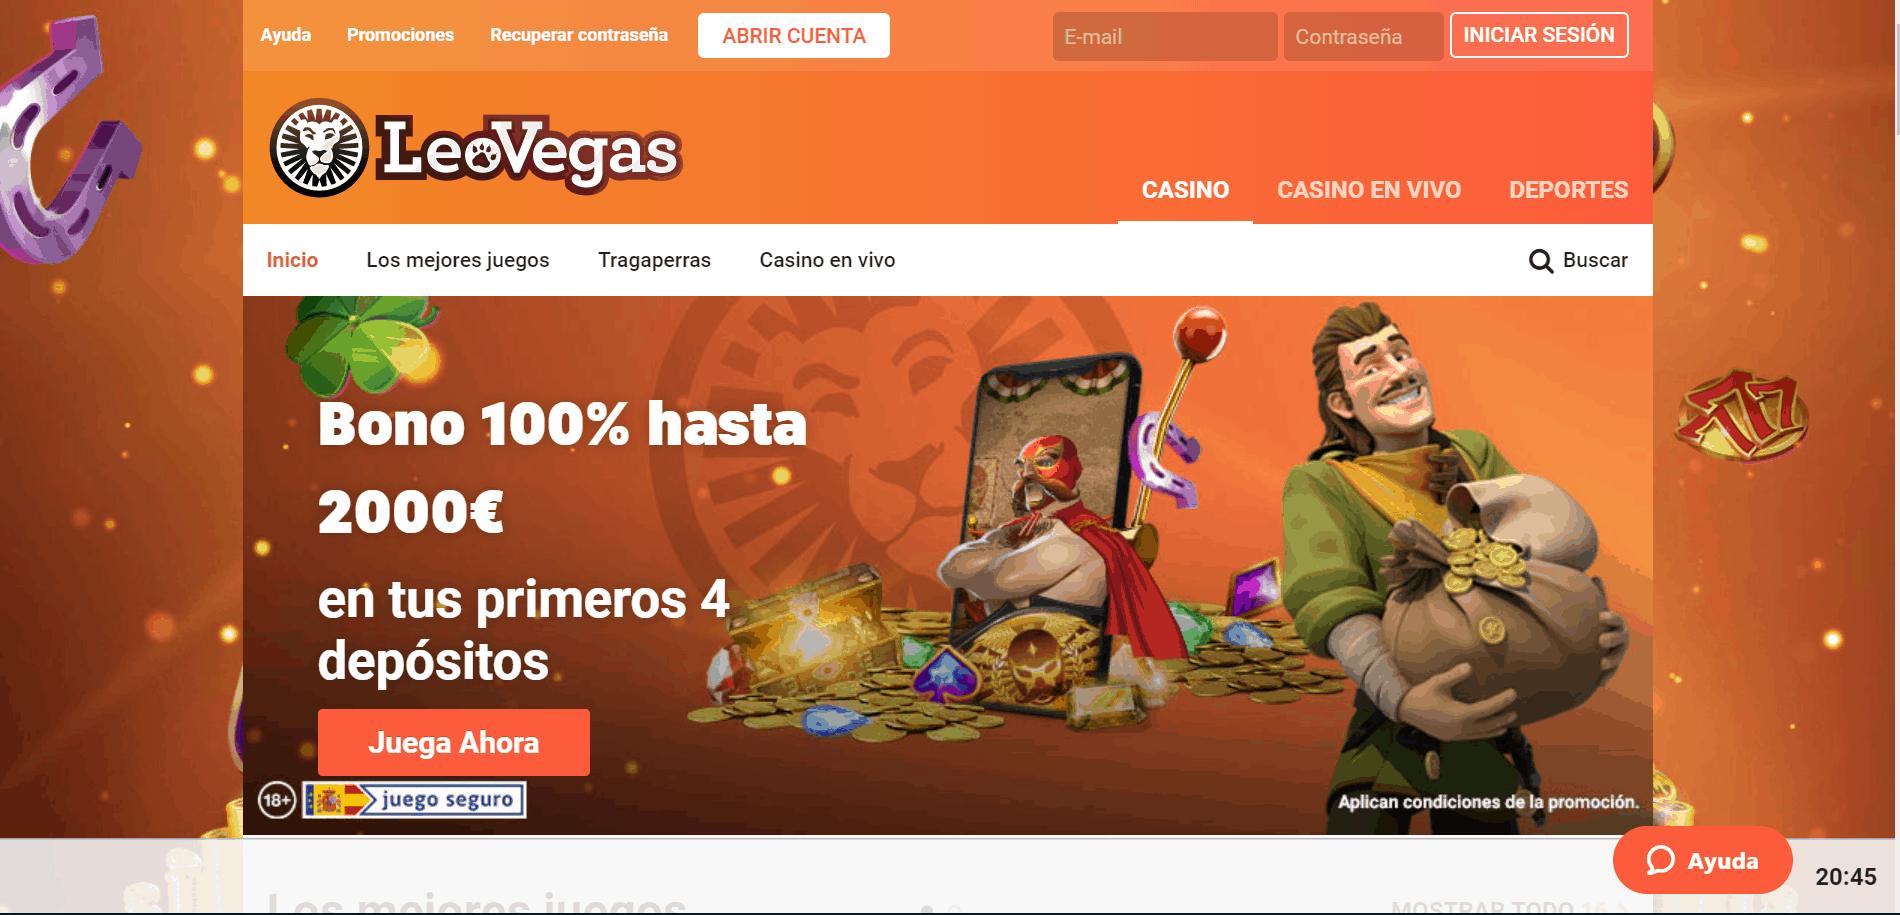 Leovegas desktop